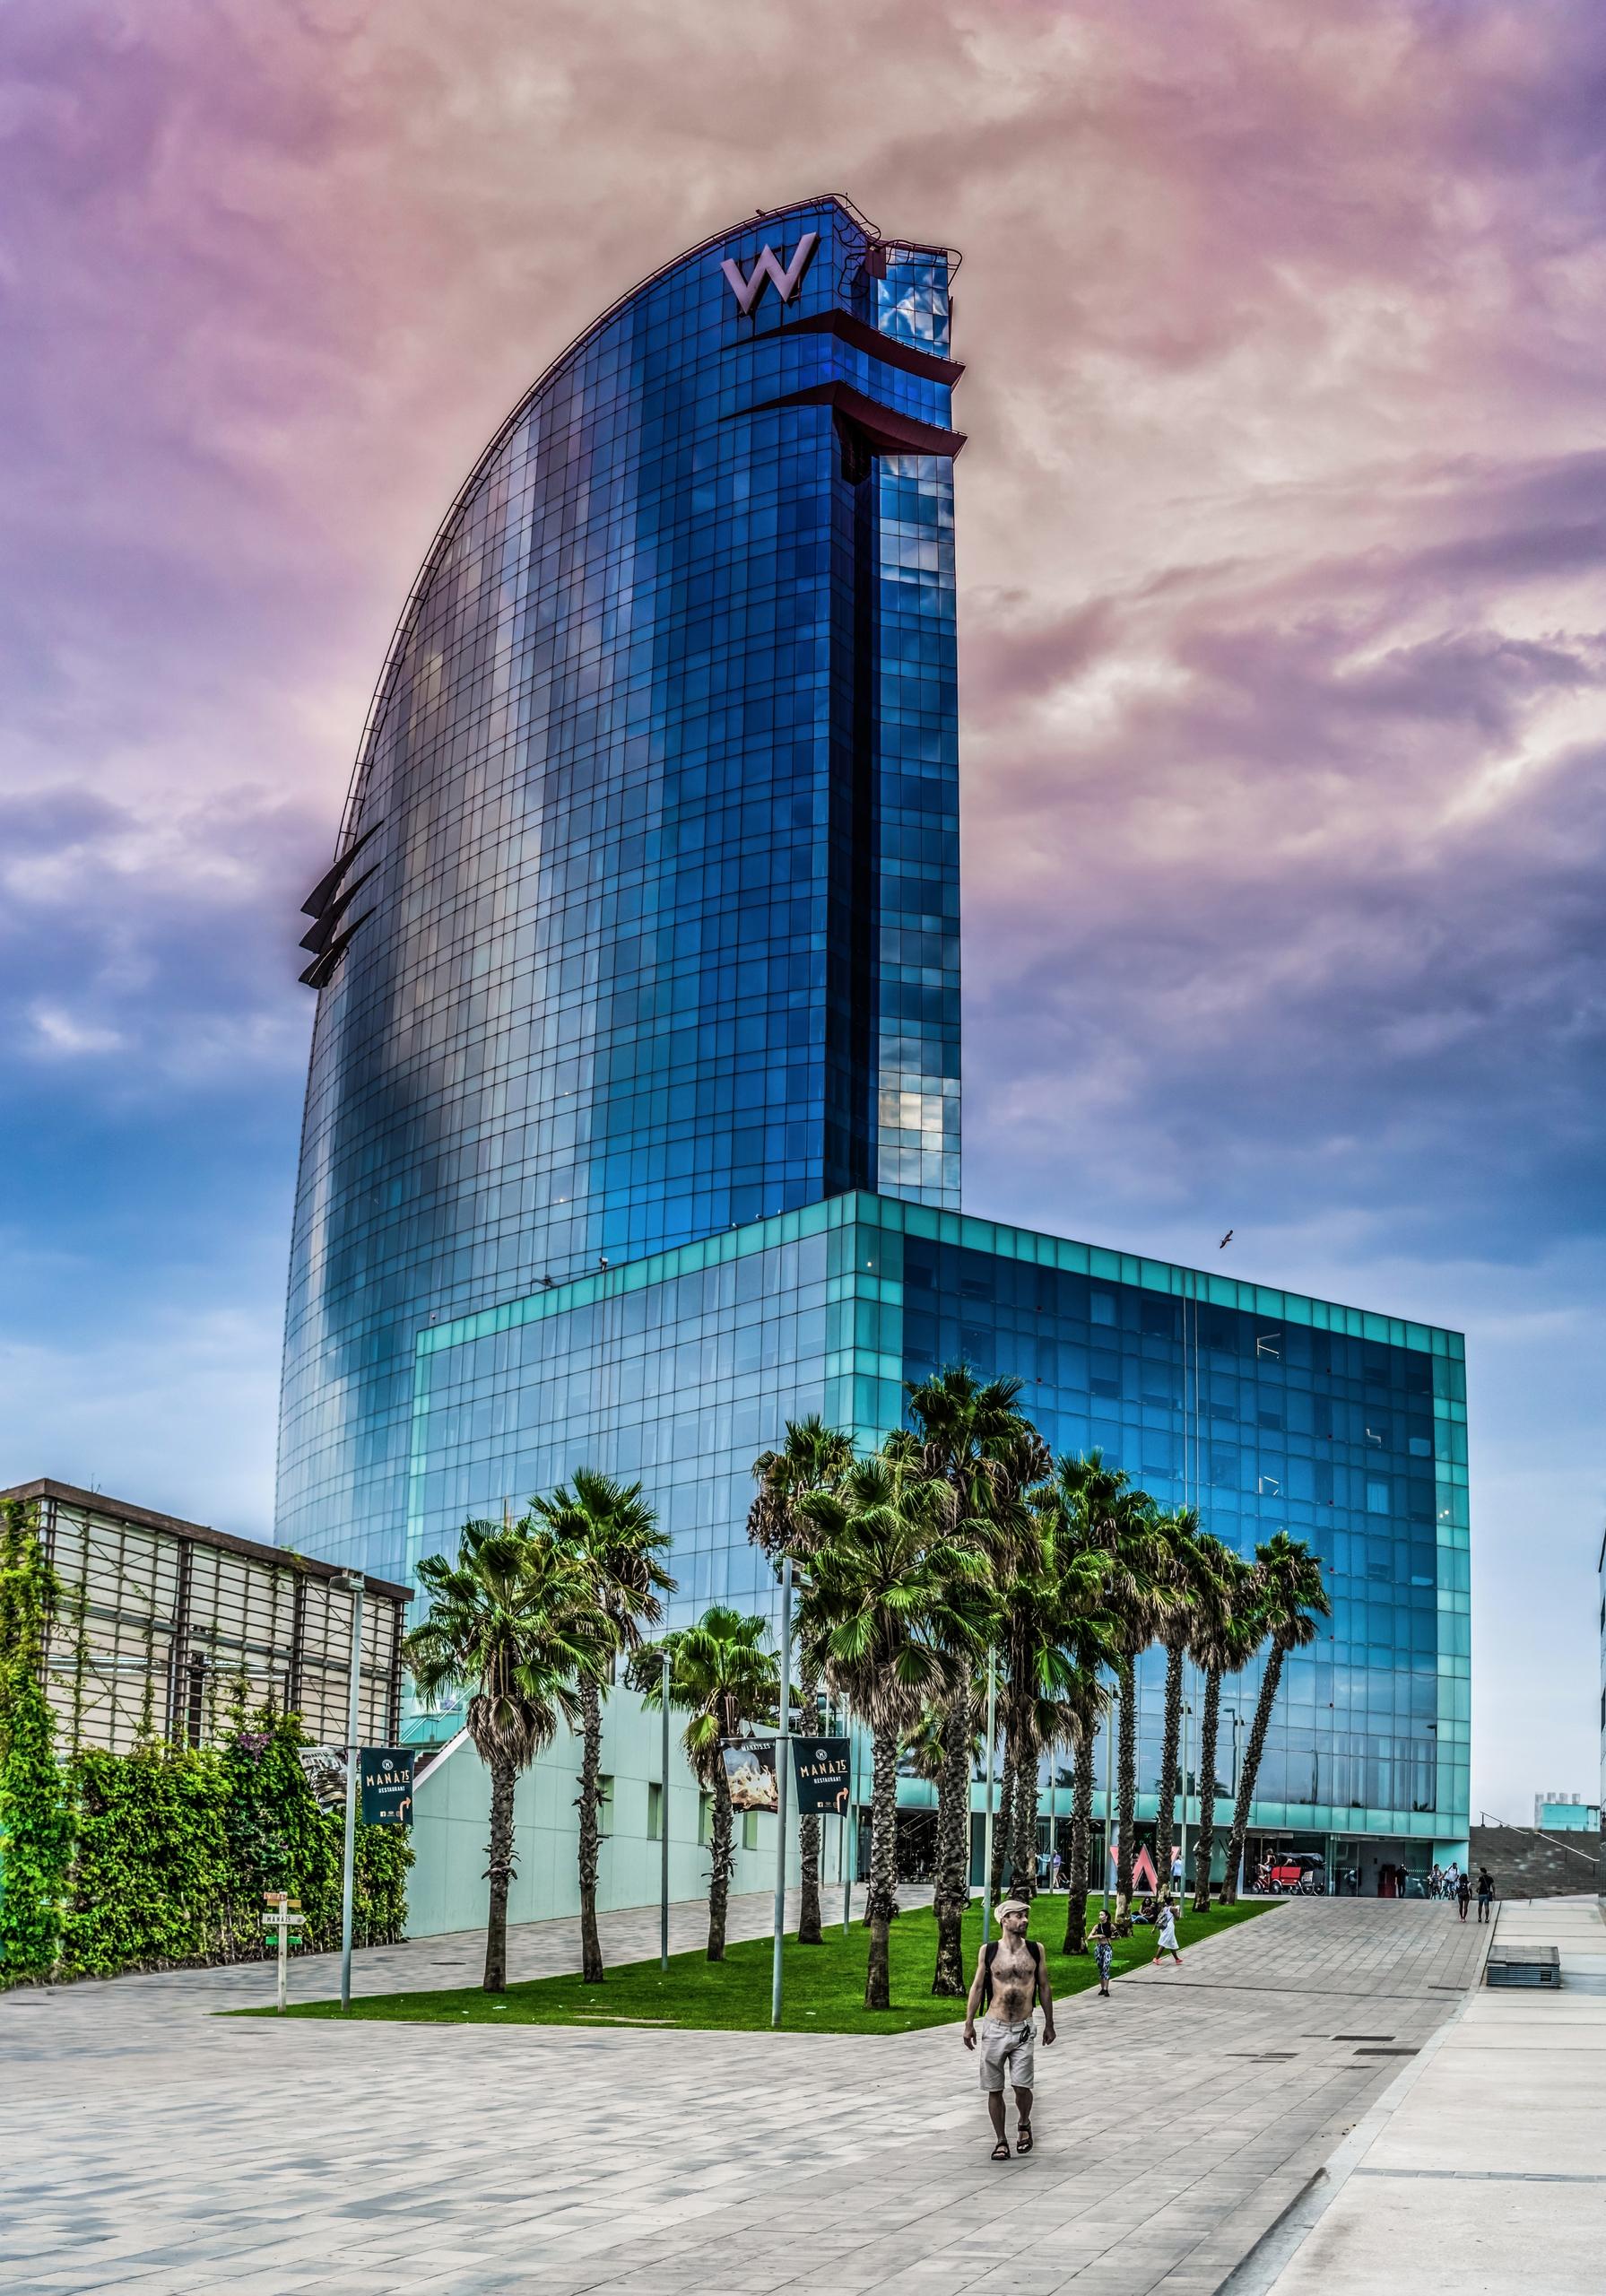 Hotel landmark beach Barcelona - rickschwartz | ello